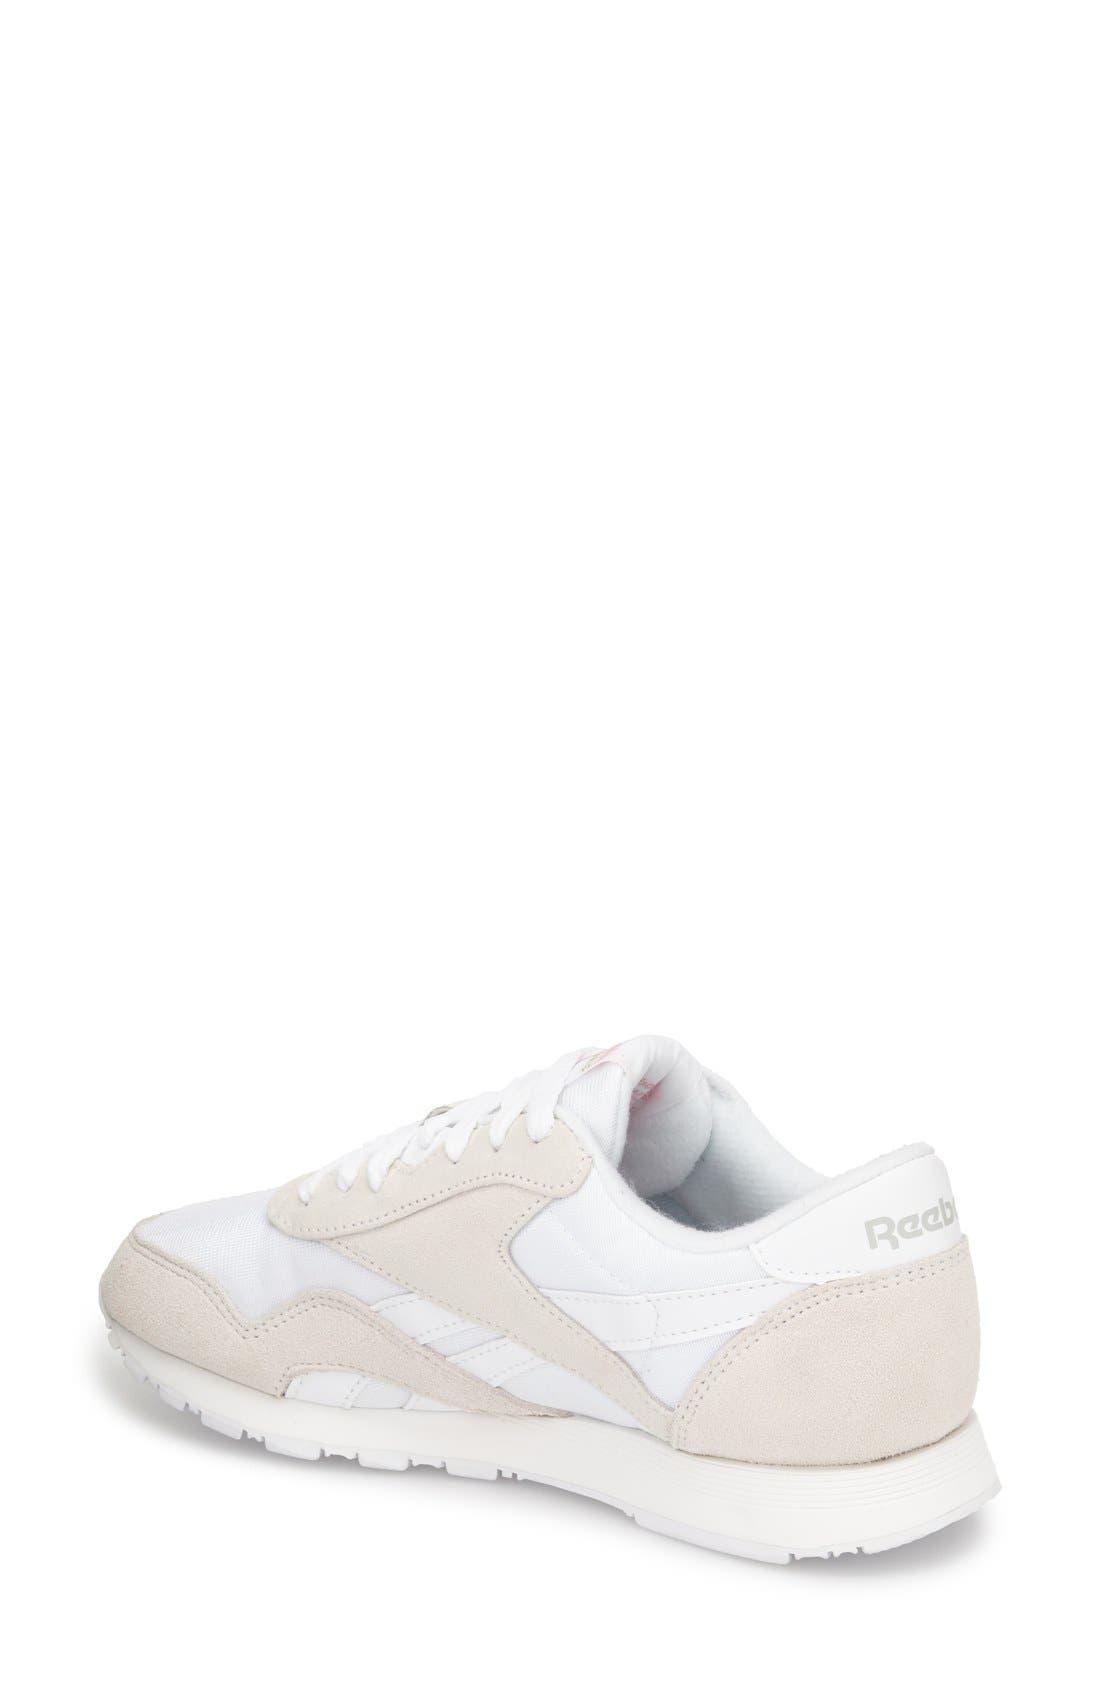 ,                             Classic Nylon Sneaker,                             Alternate thumbnail 36, color,                             101